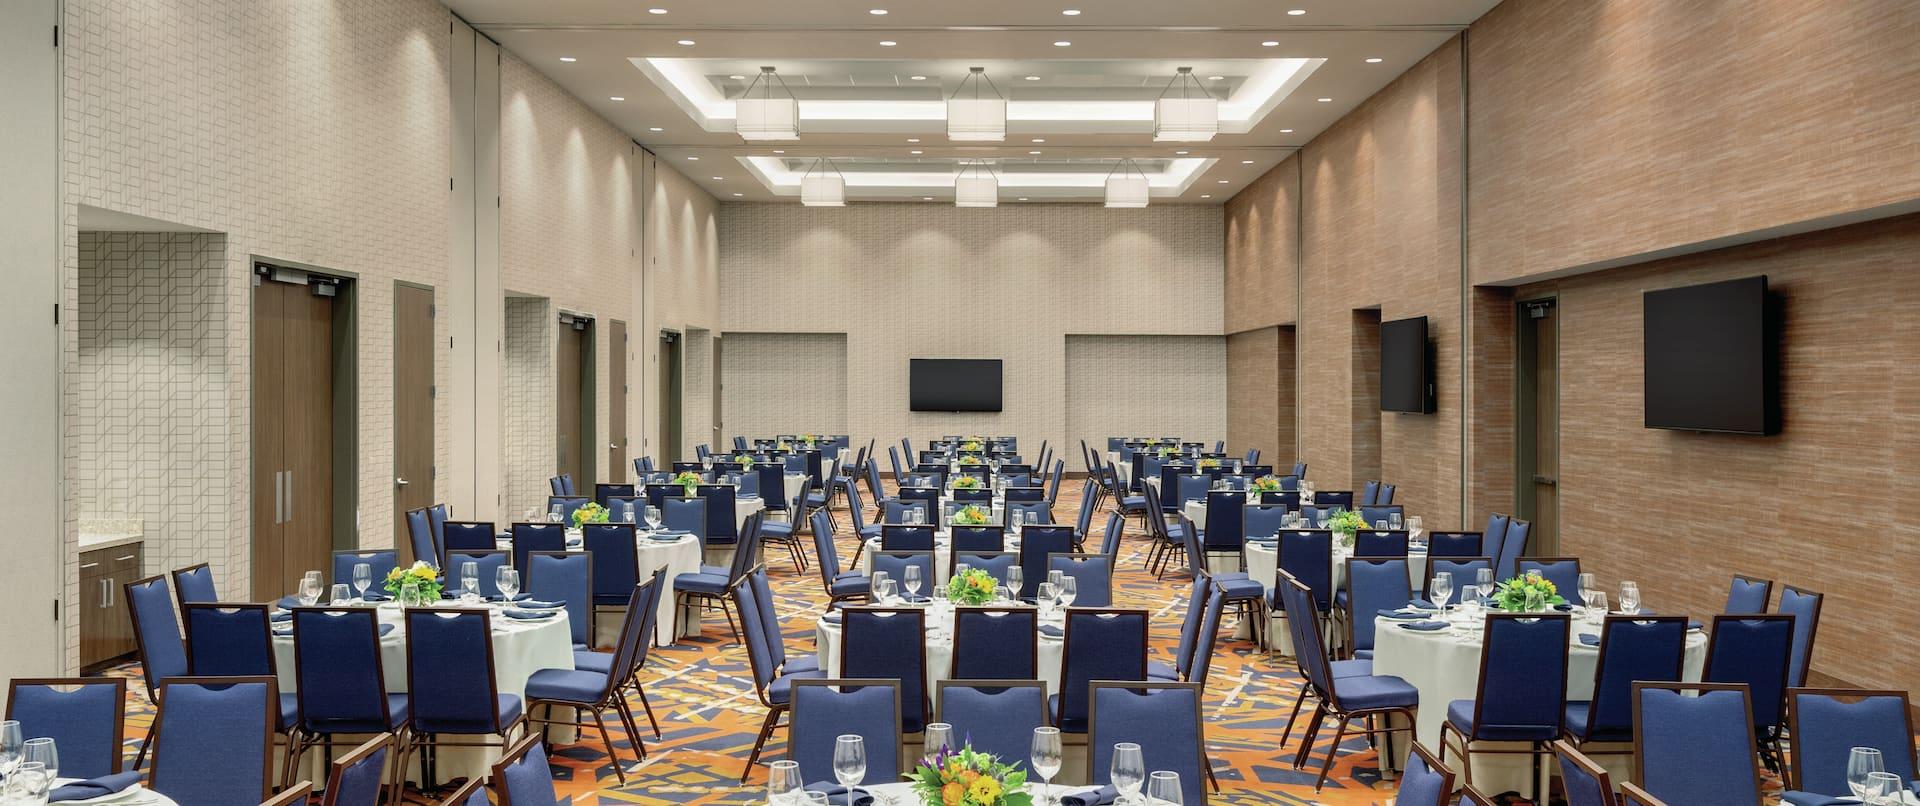 Ballroom Set up for Reception